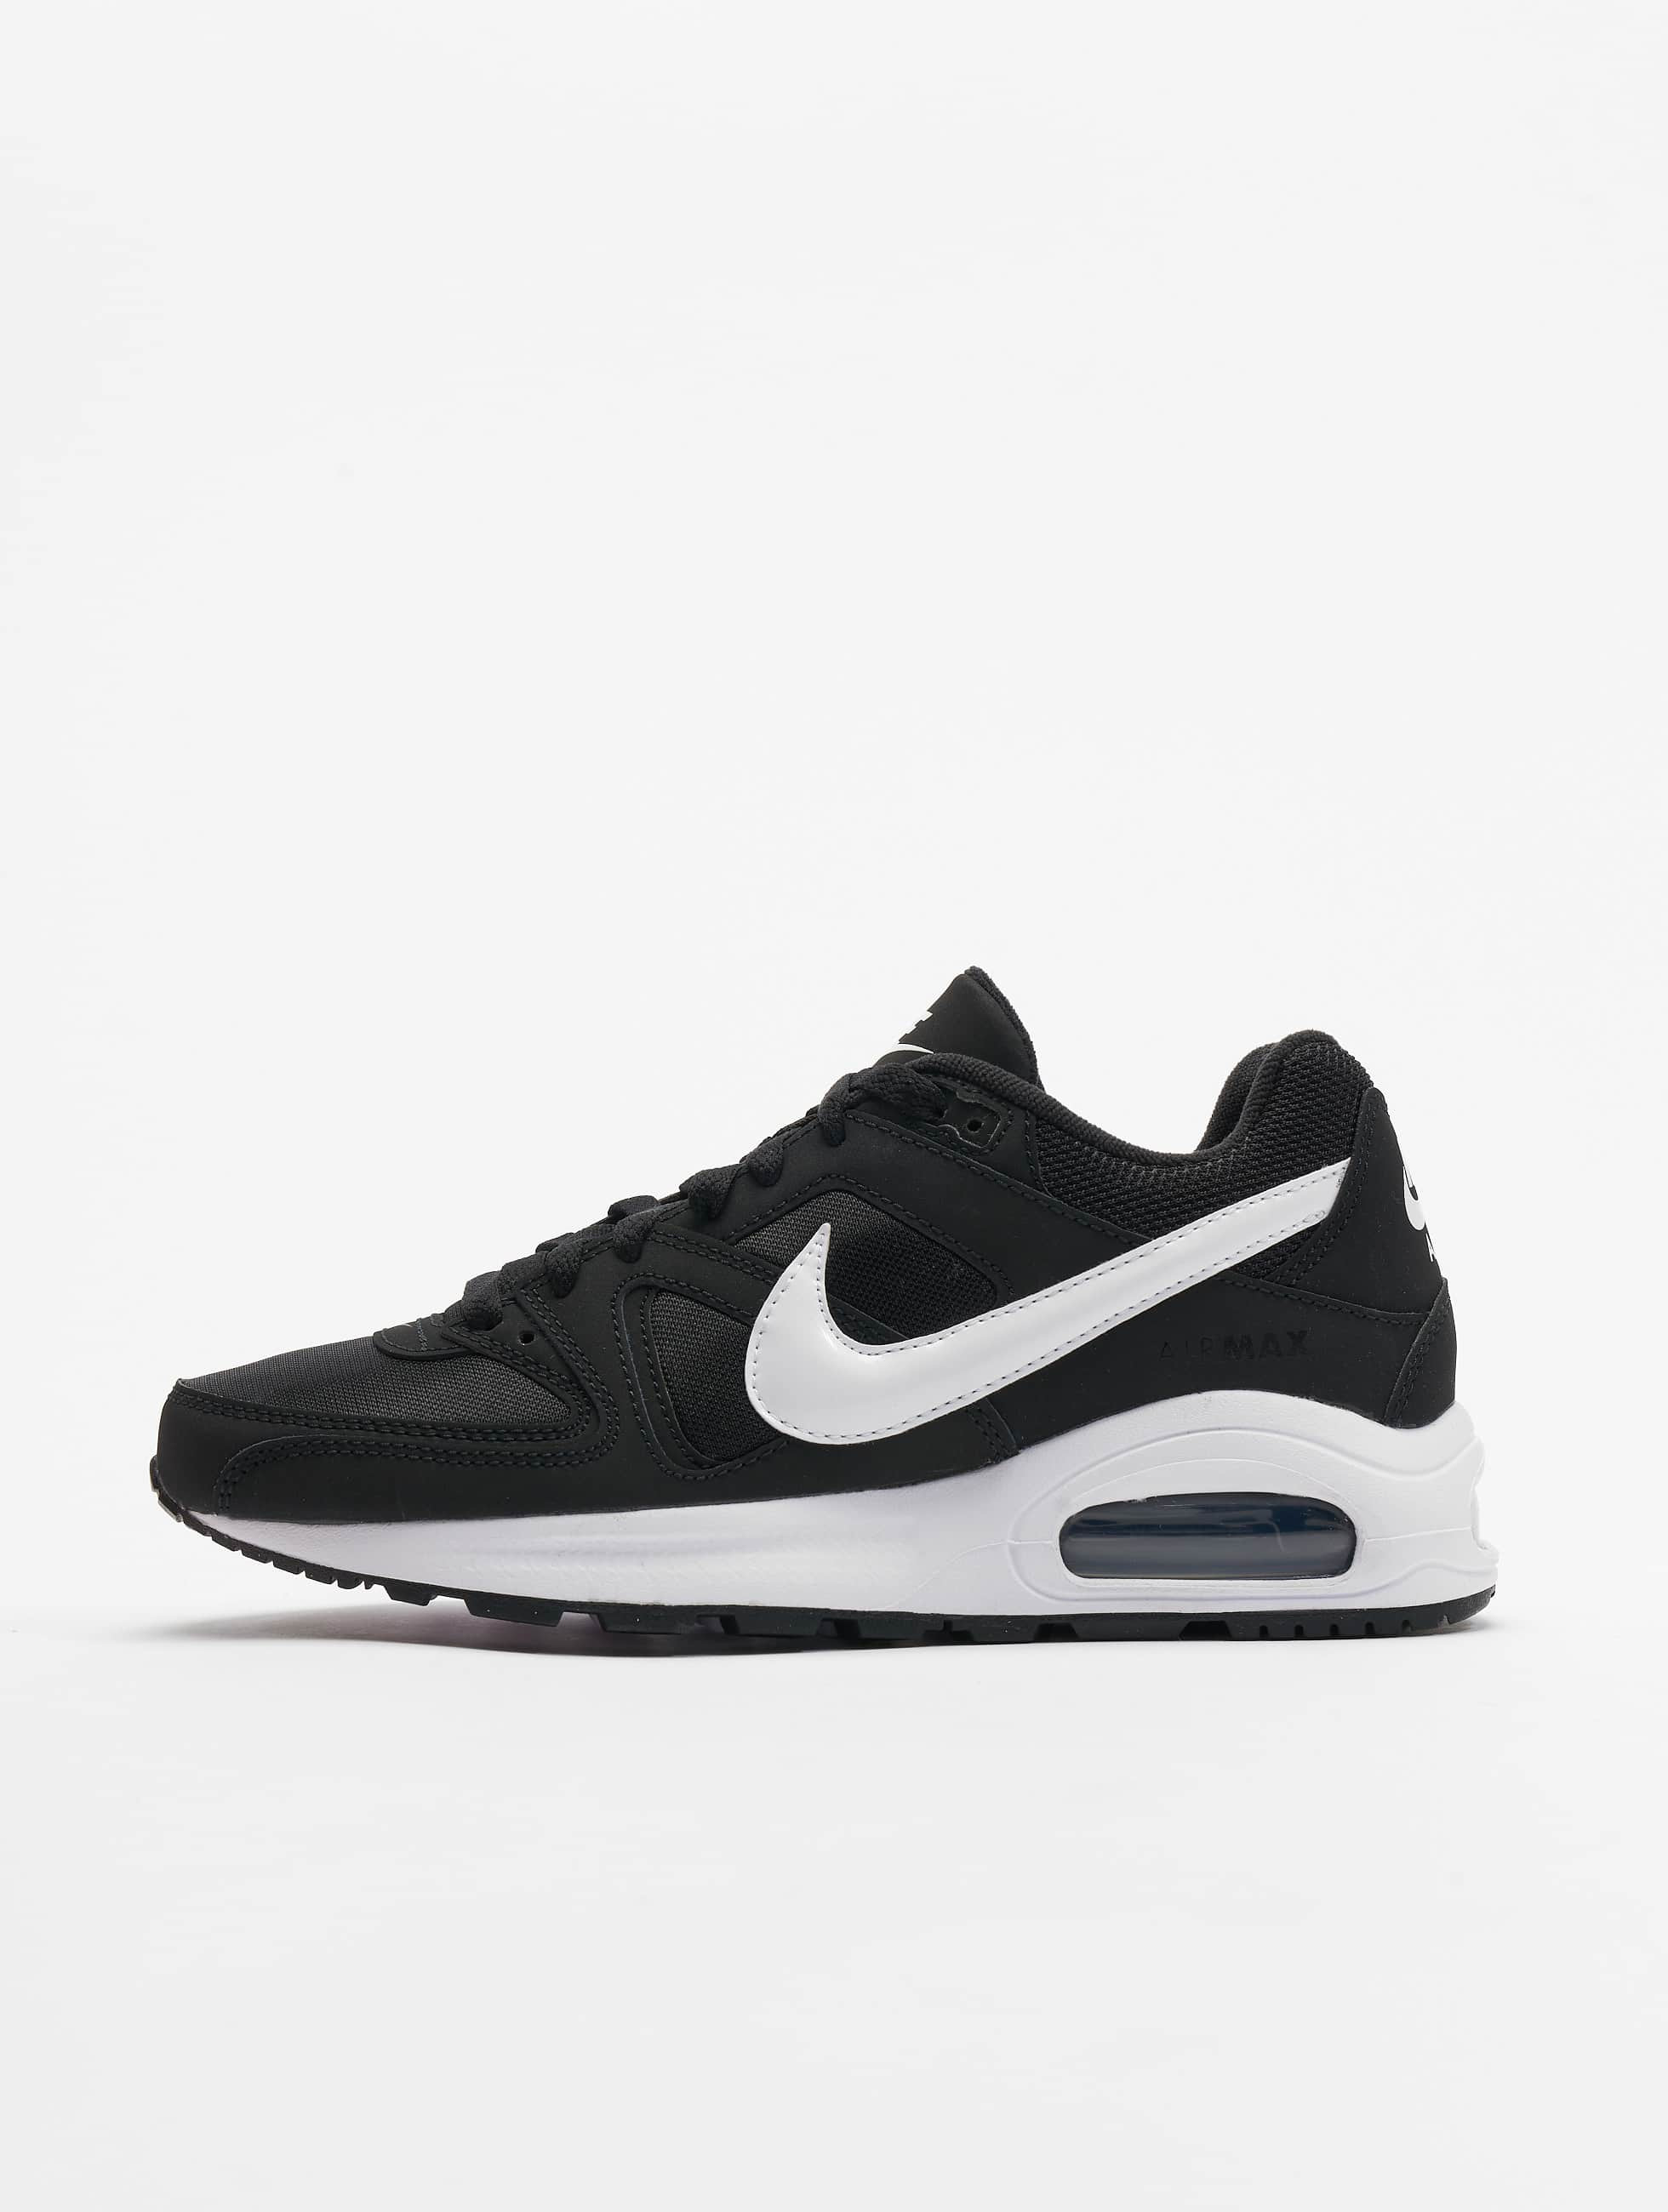 468078bf077 Nike Kinder Sneaker Air Max Command Flex (GS) in schwarz 662207